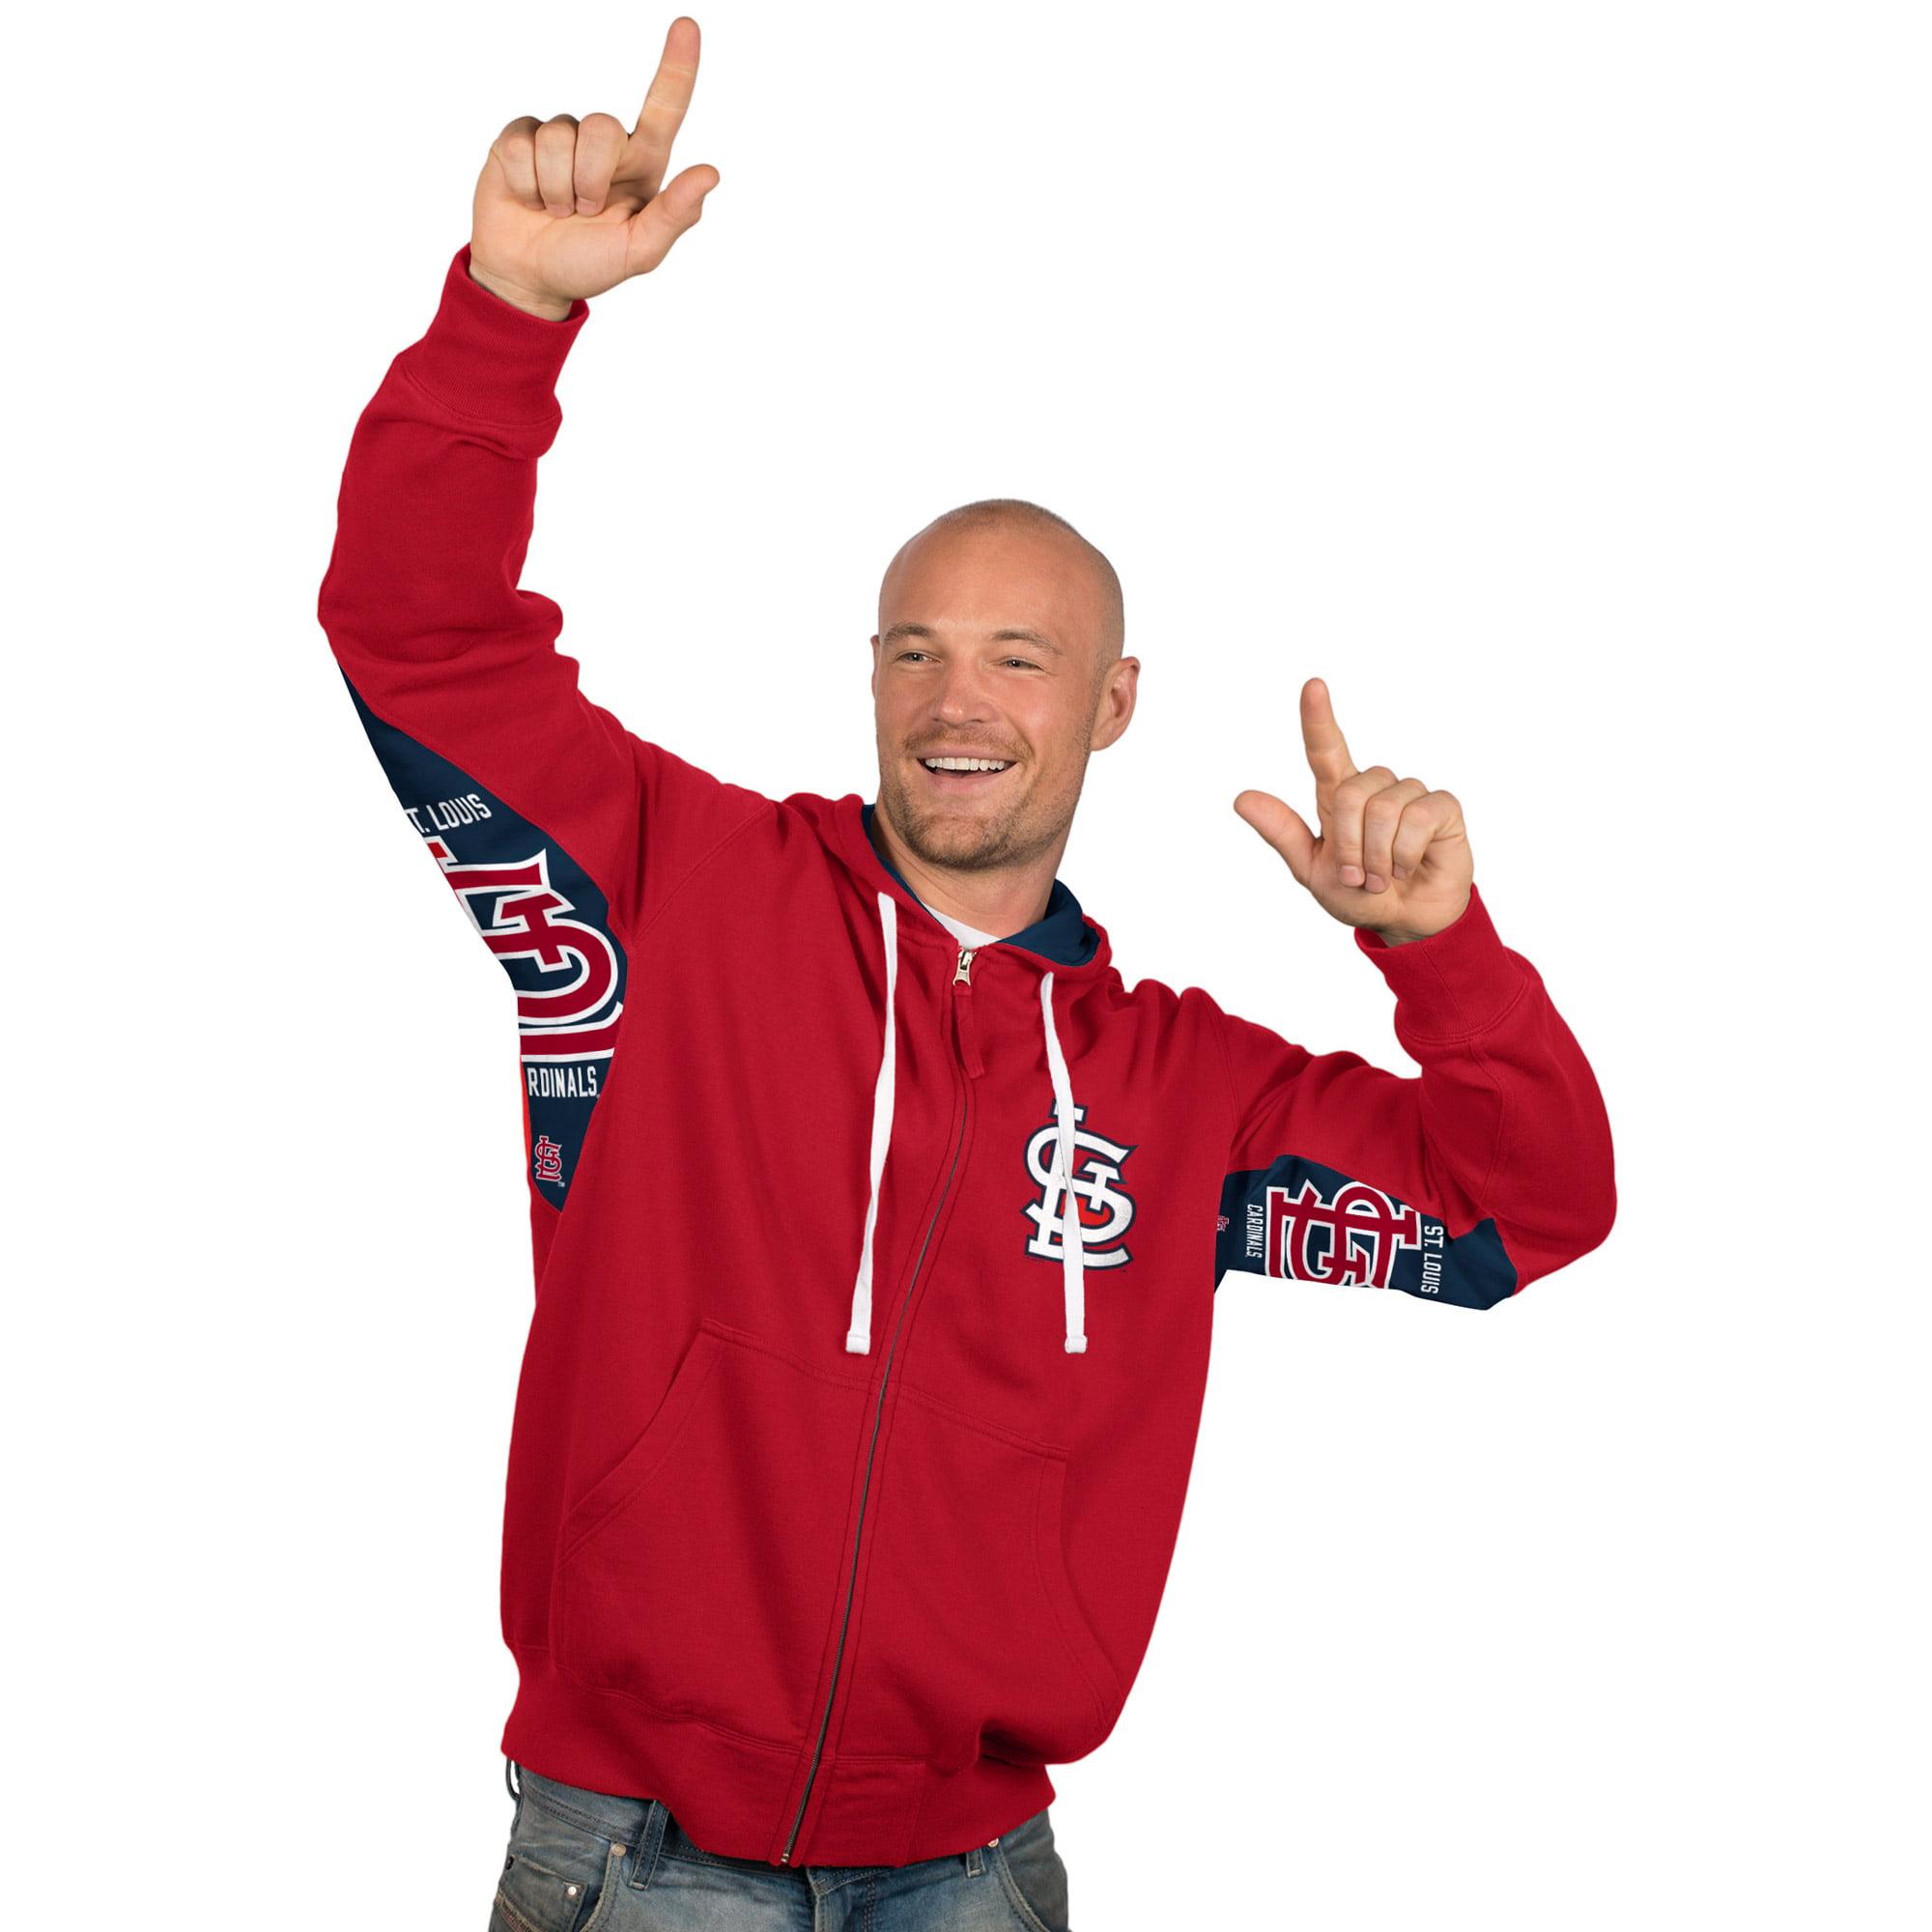 St. Louis Cardinals Hands High Full Zip Hoodie - Red